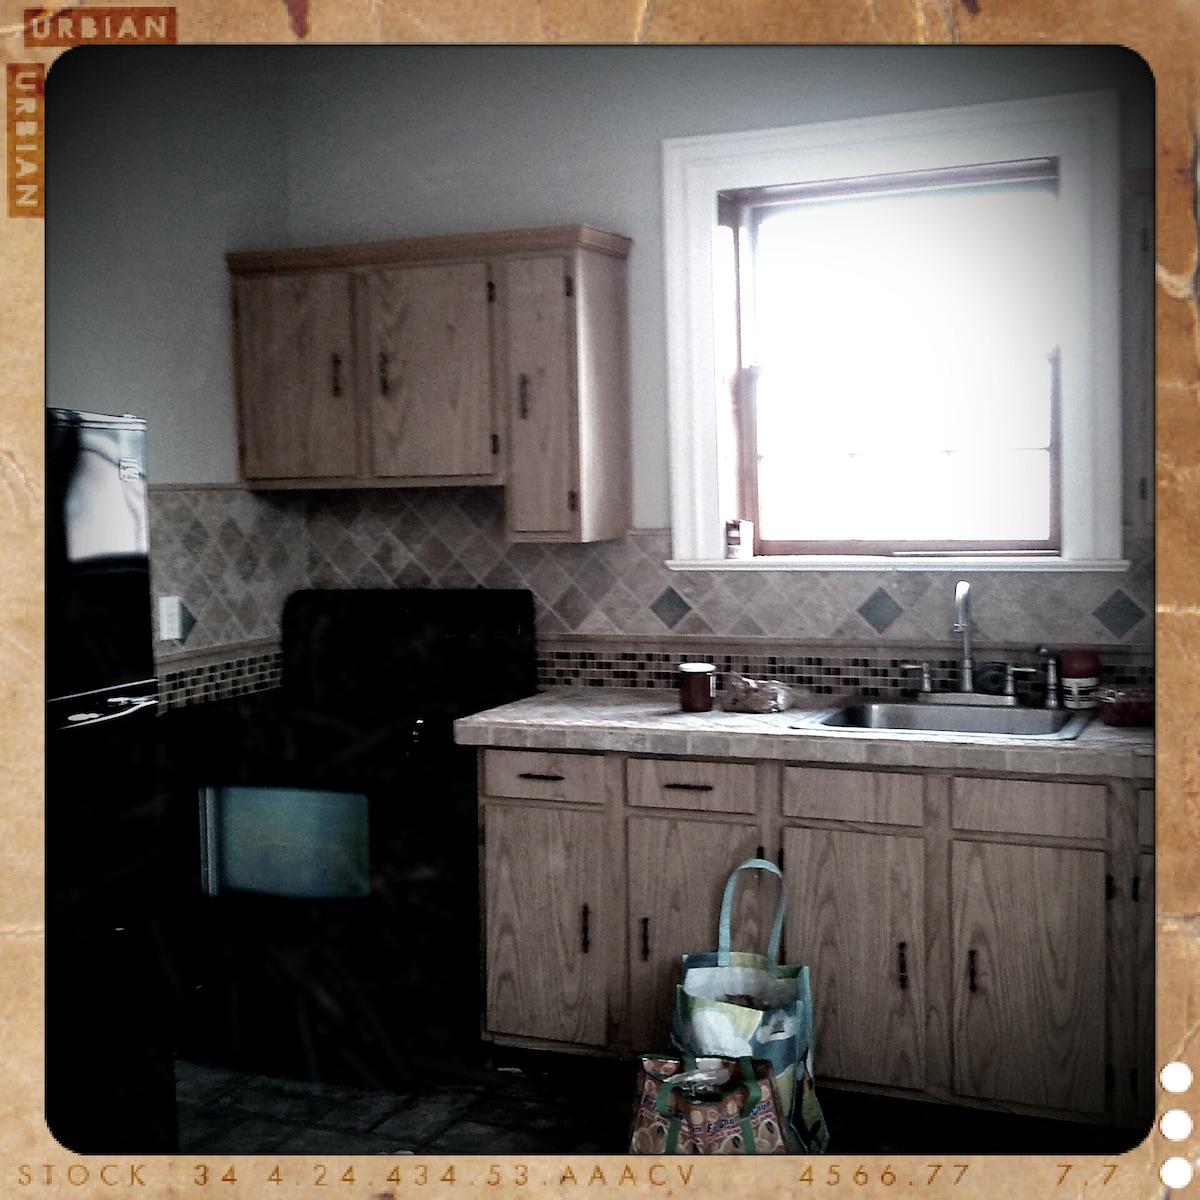 shared-space kitchen.